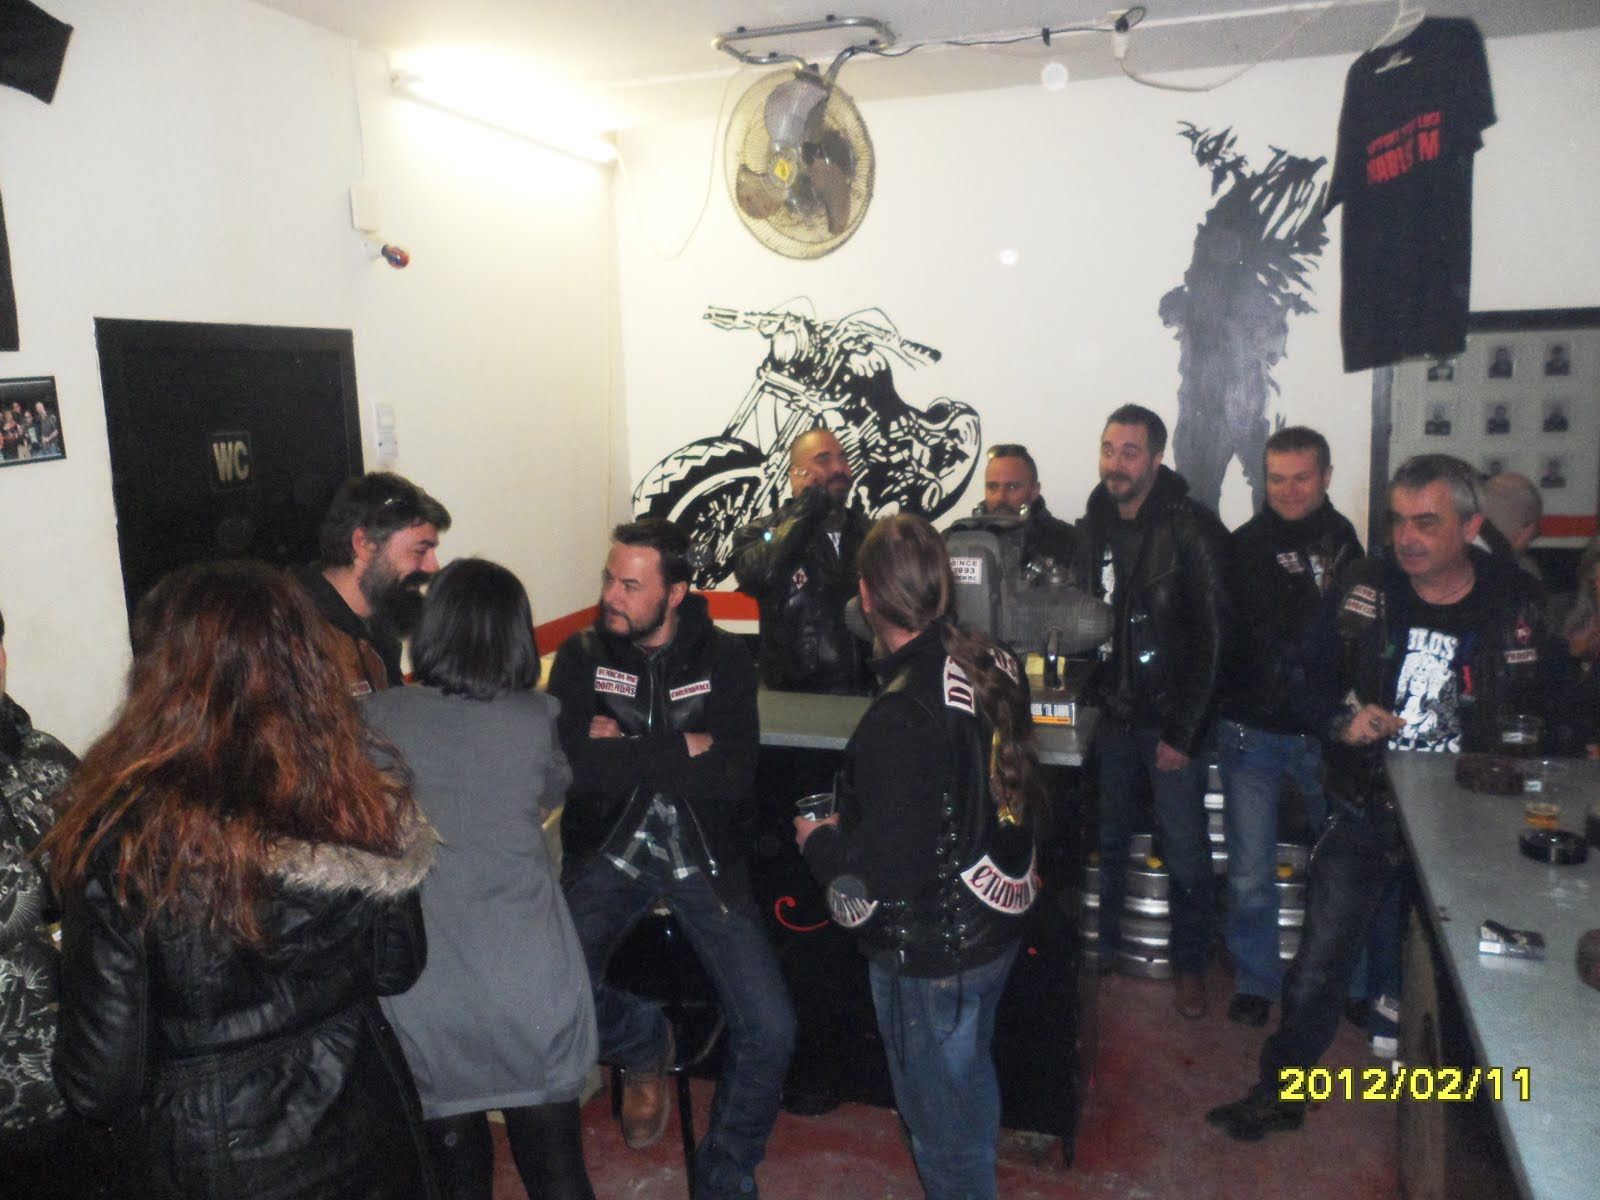 Diablos MC (Motorcycle Club) - One Percenter Bikers |Diablos Motorcycle Club Mentone